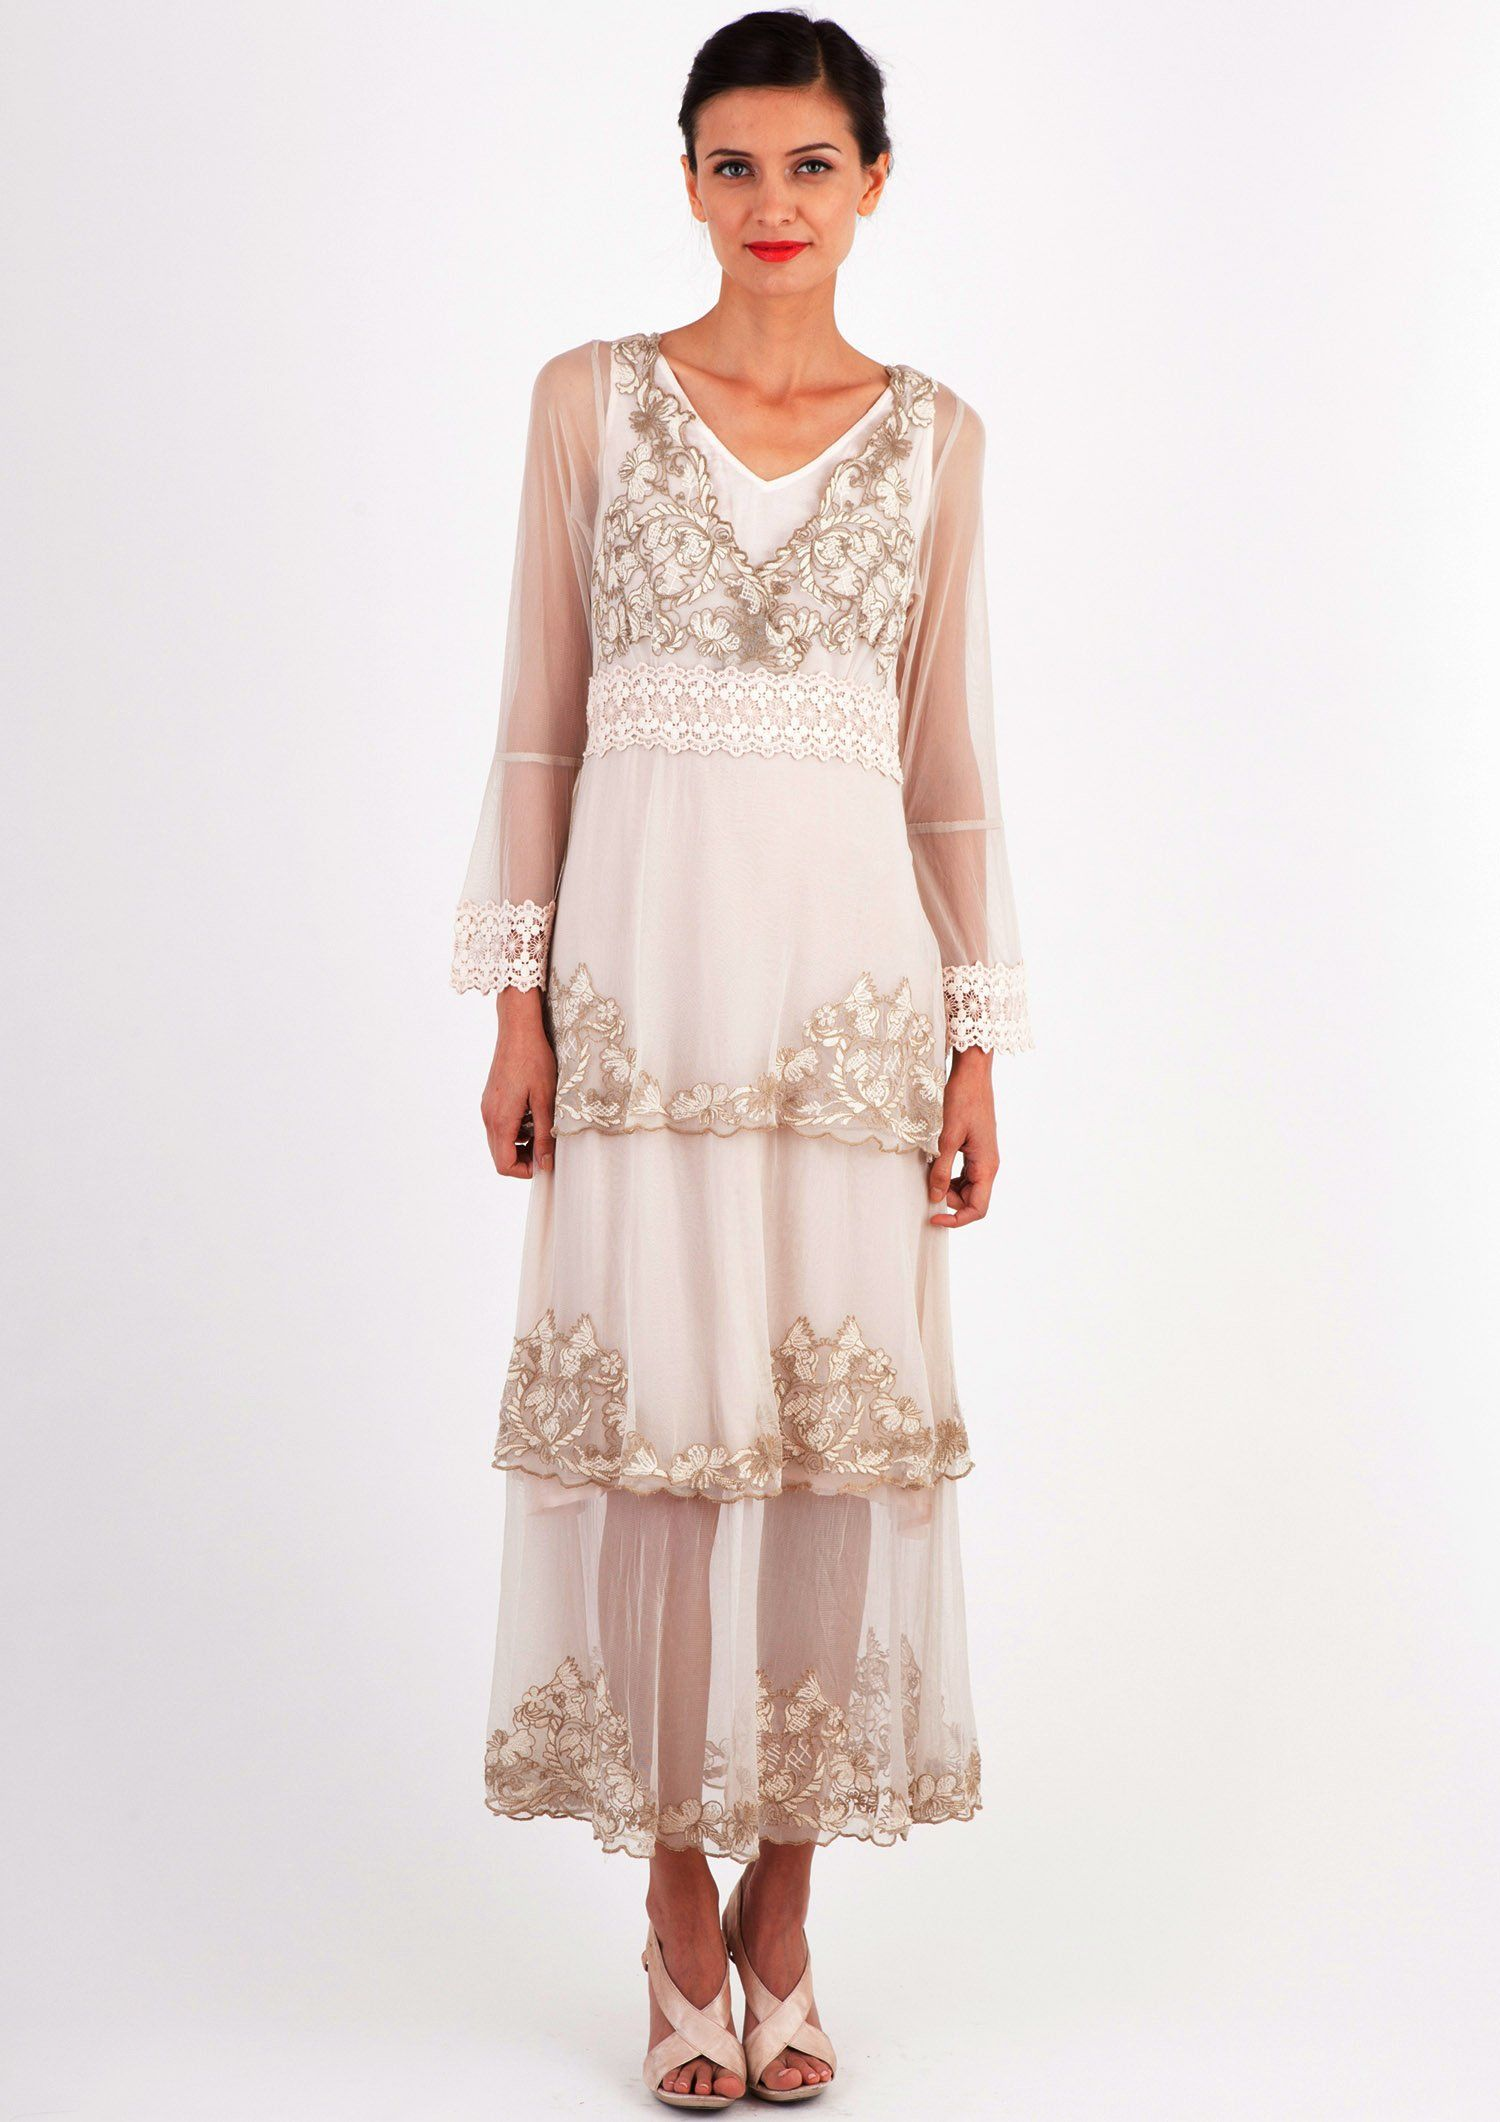 1910s 1920s Fantasy Layered Chiffon Party Dress In Beige By Nataya 198 00 At Vintagedancer